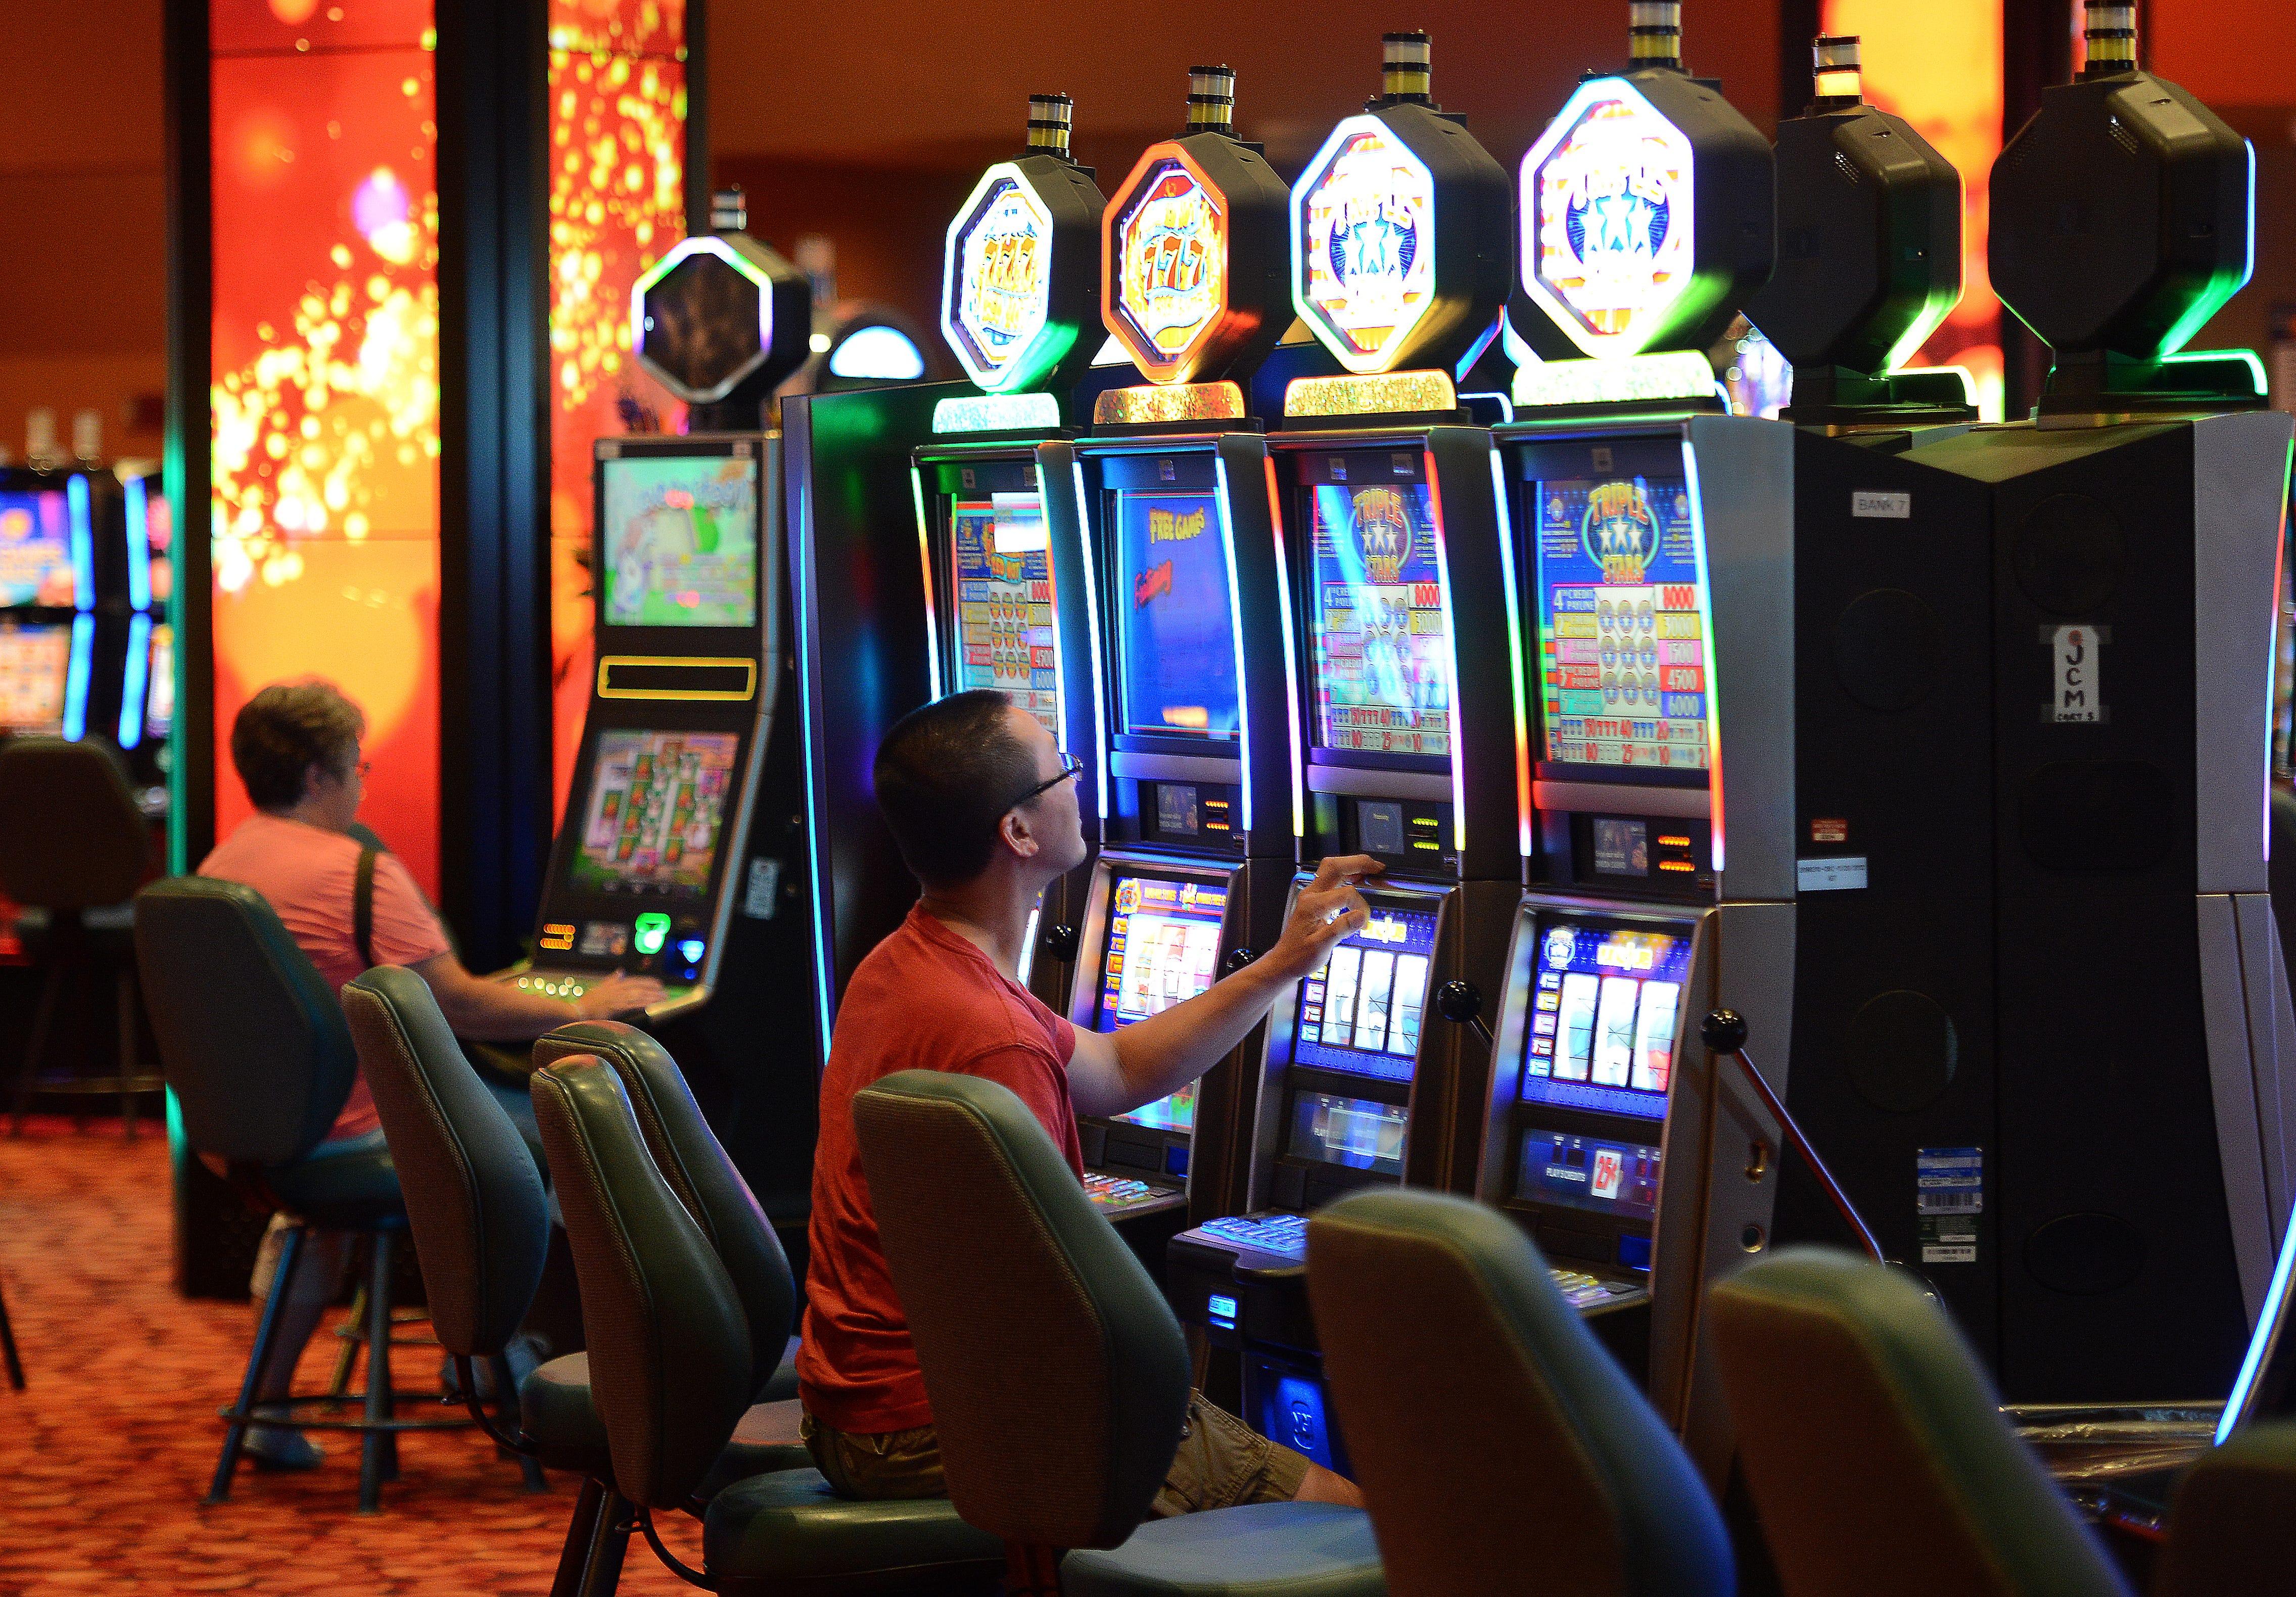 Peter green reading casino online casino south africa no deposit bonus